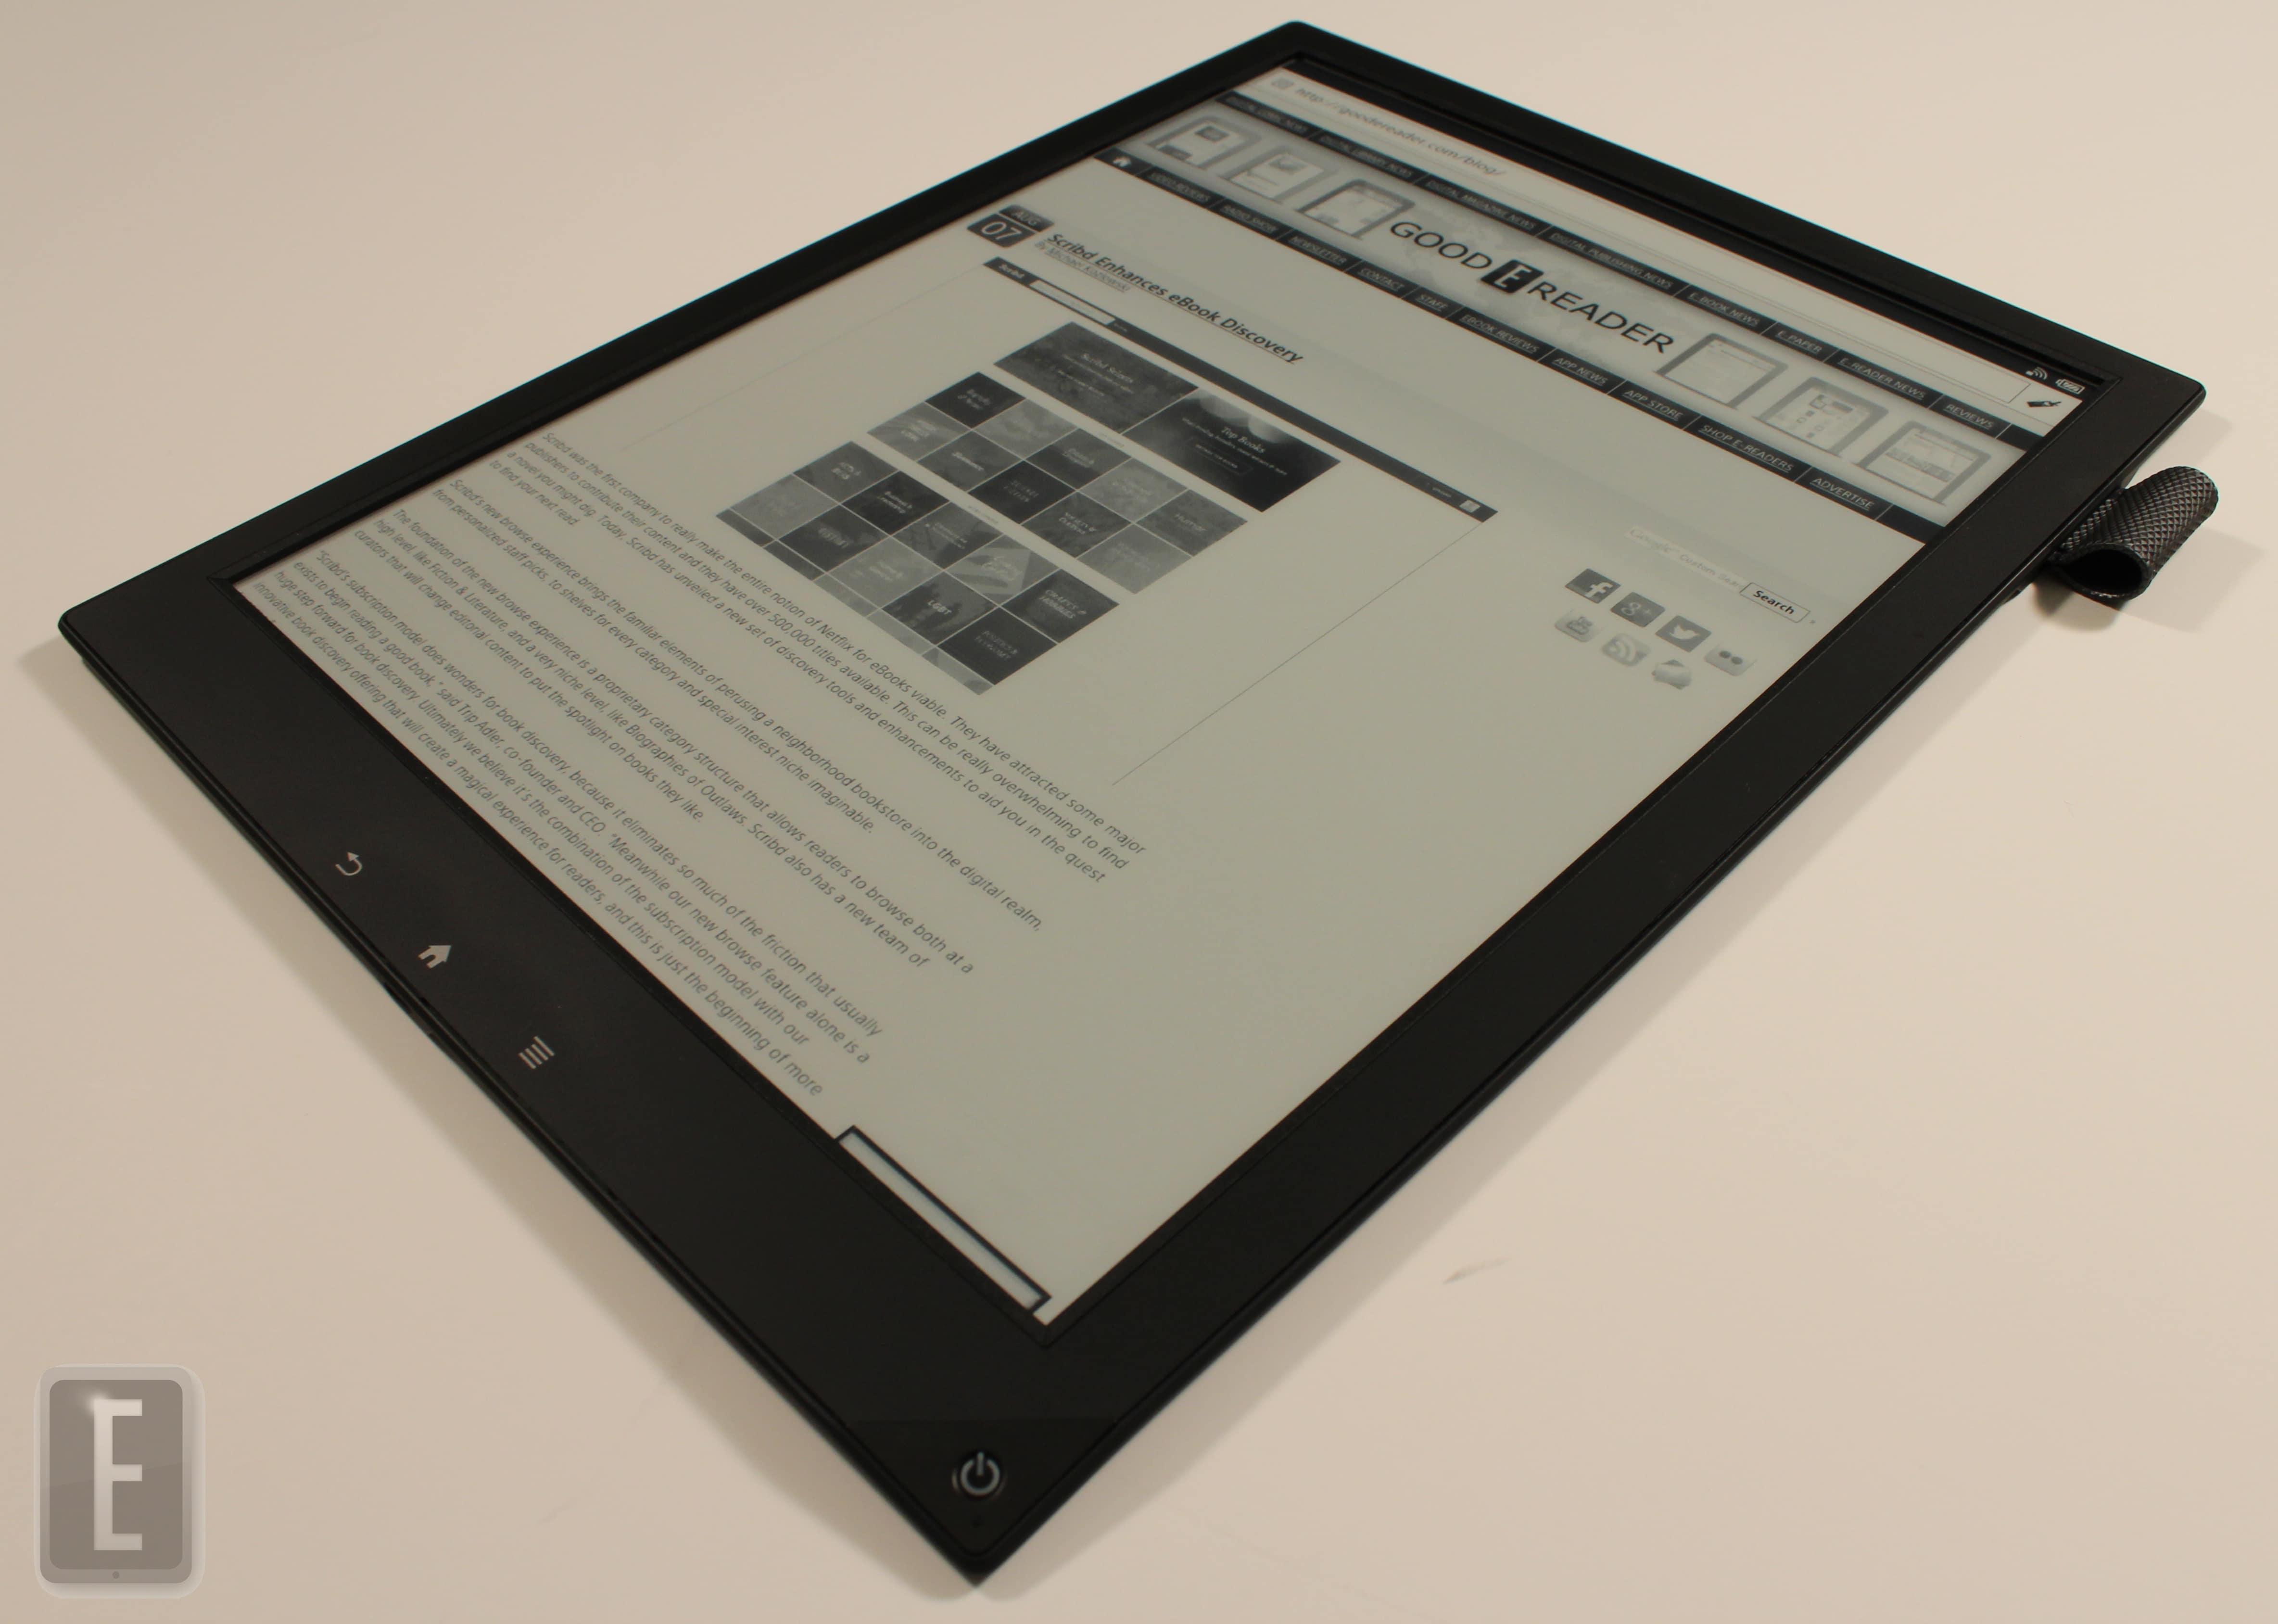 Sony Ebook S